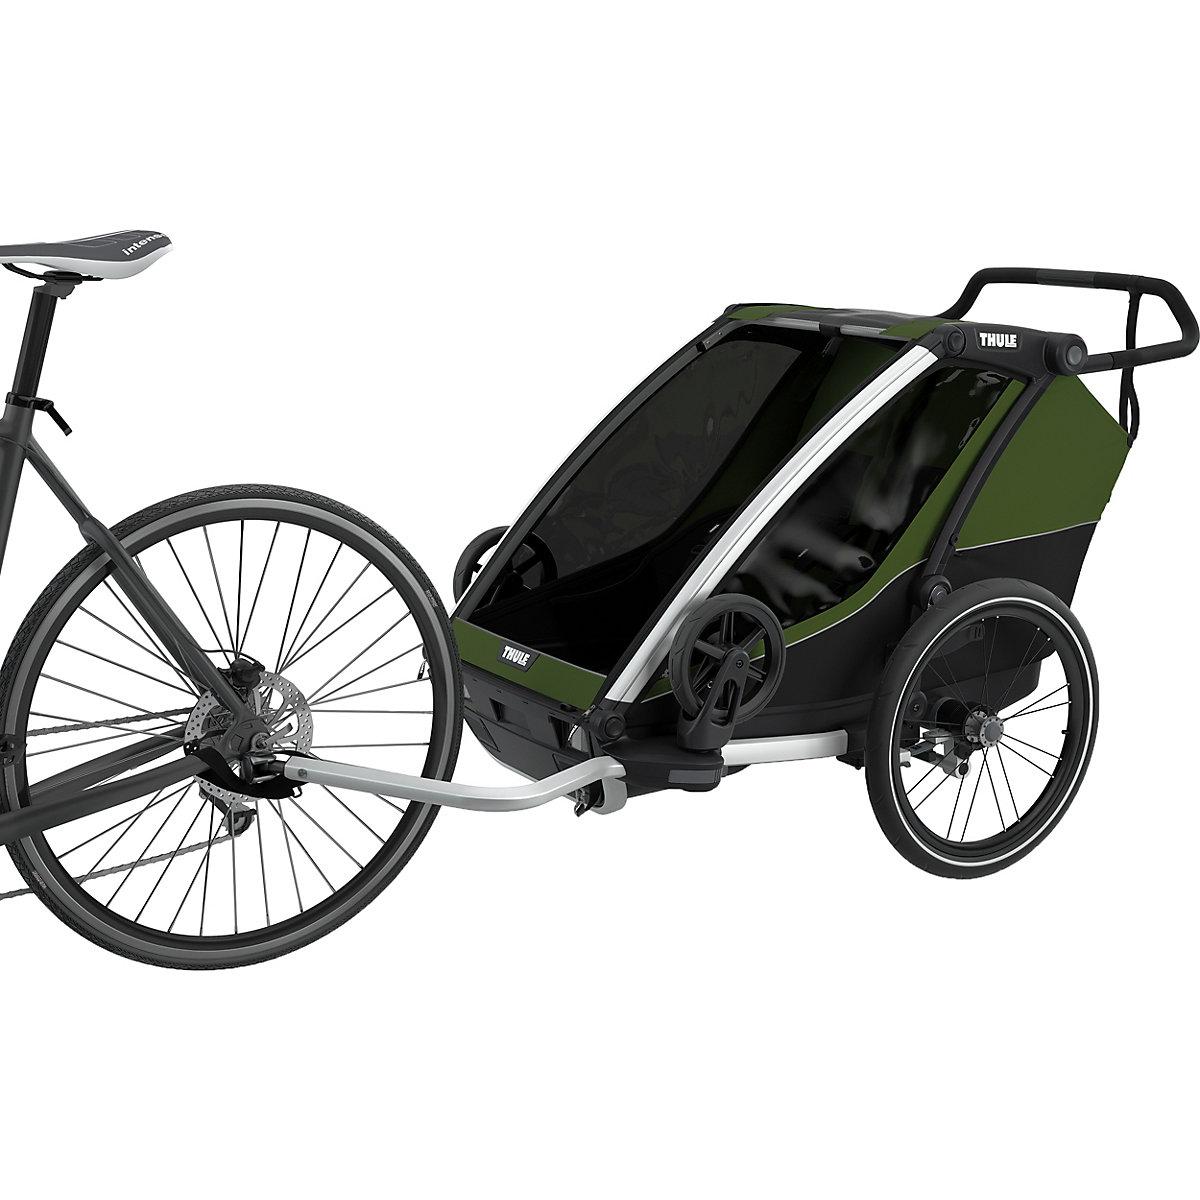 [Sammeldeal] mytoys Outdoor Flash Sale 15% z.B. Thule Fahrradanhänger Chariot Cab 2, Cypress Green